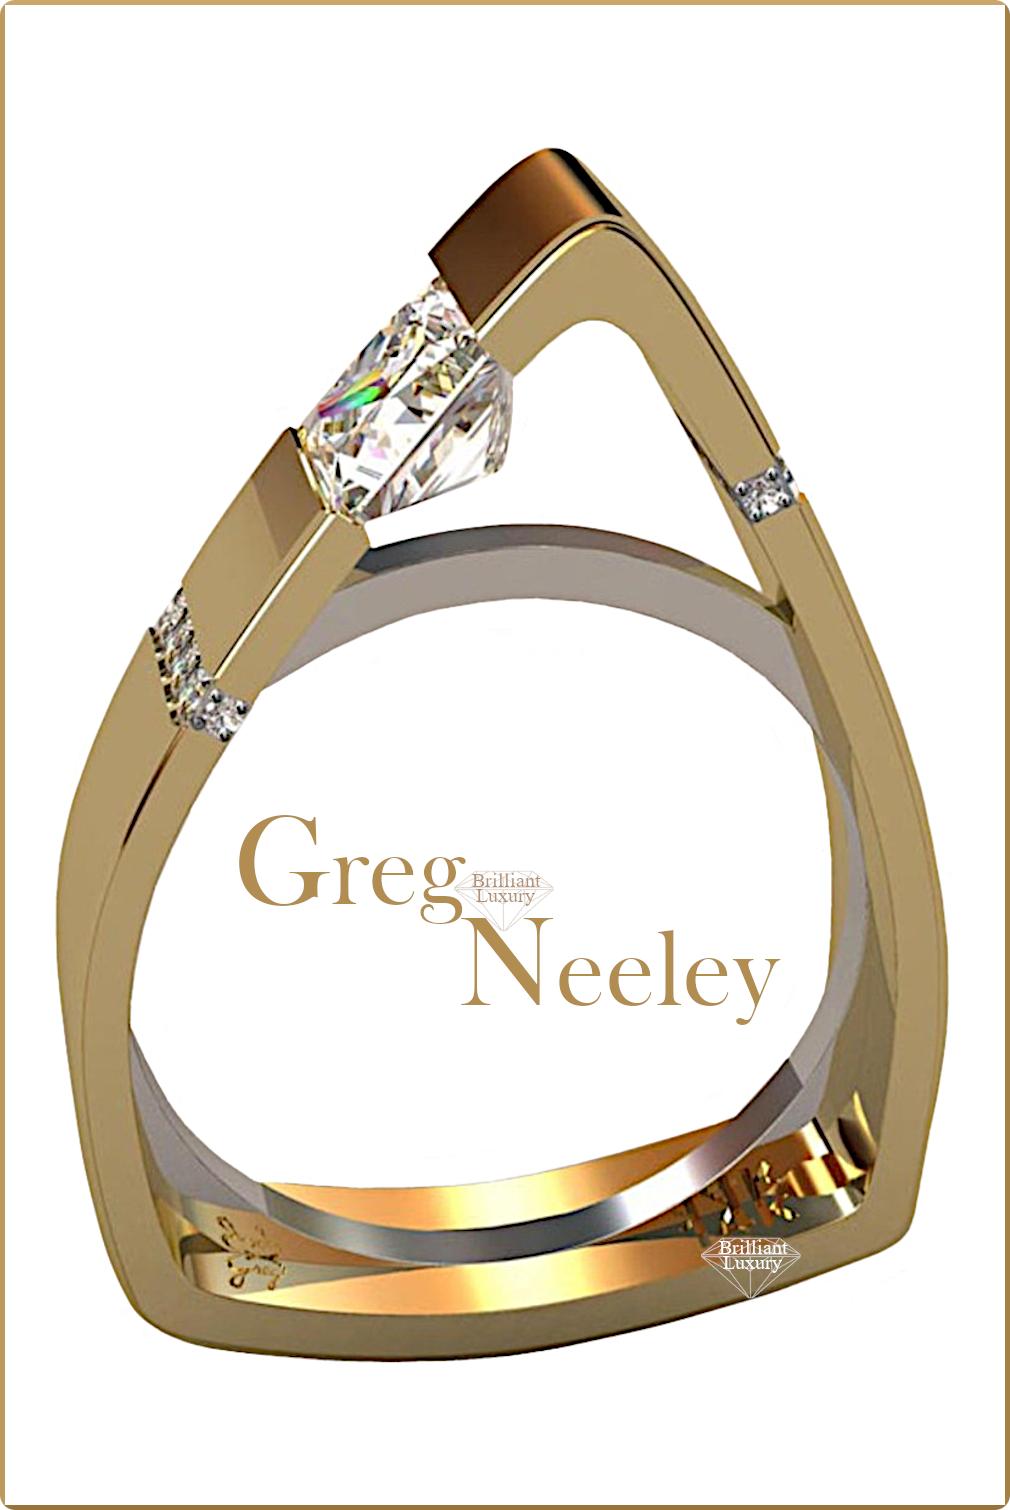 ♦Greg Neeley North Face Princess Diamond Engagement Ring #gregneeley #jewelry #brilliantluxury